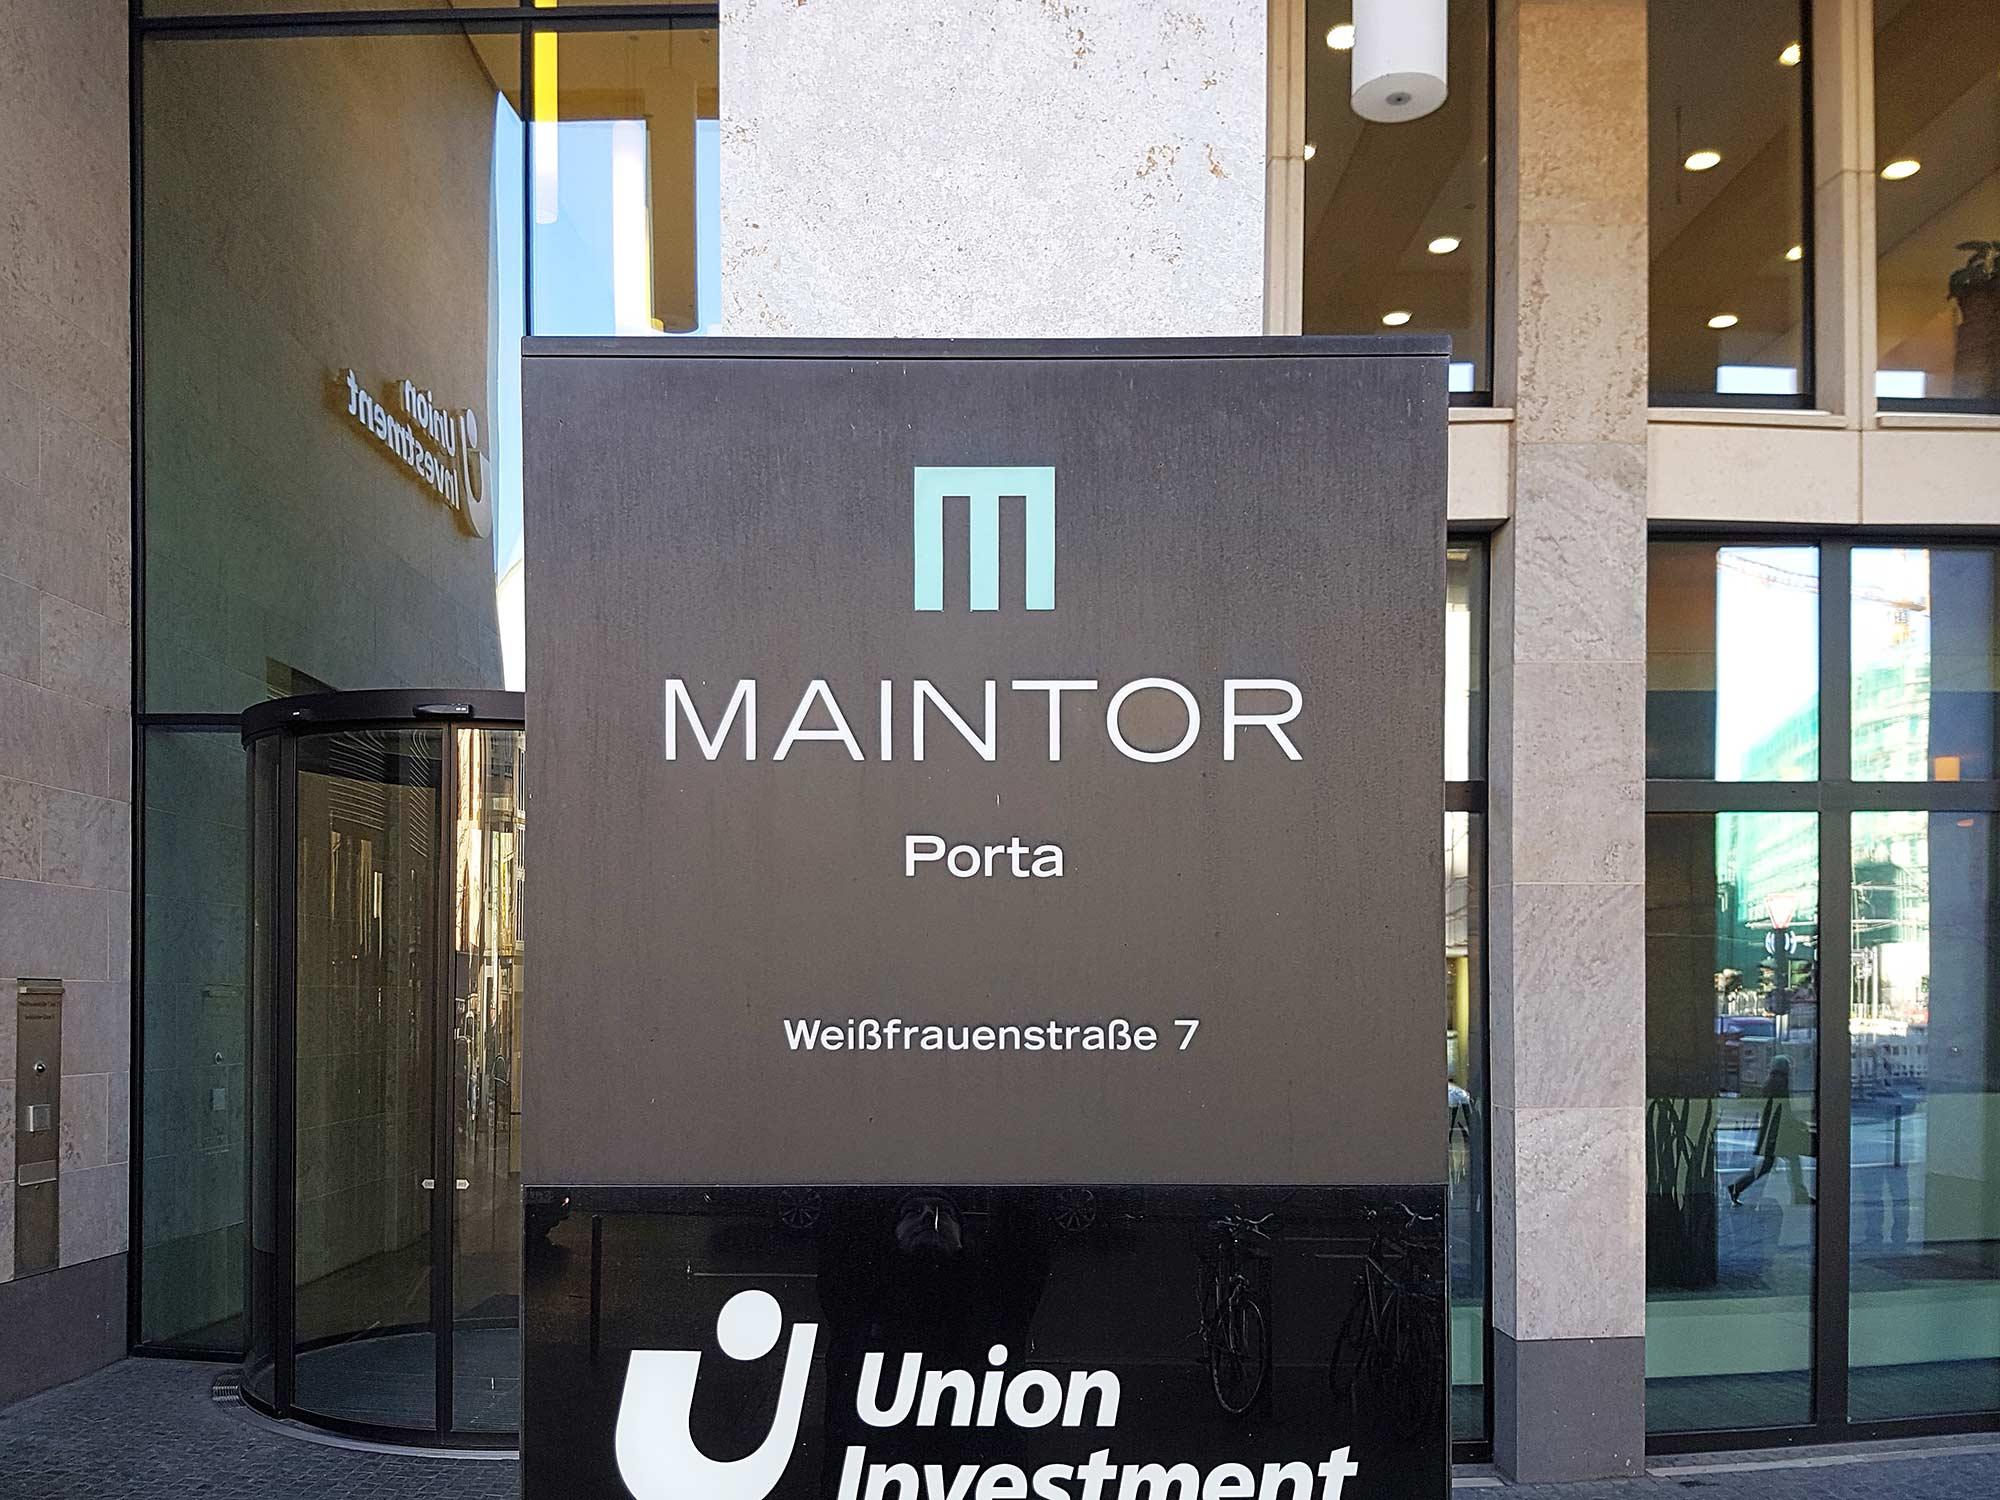 MainTor Porta Frankfurt - Union Investment Logo